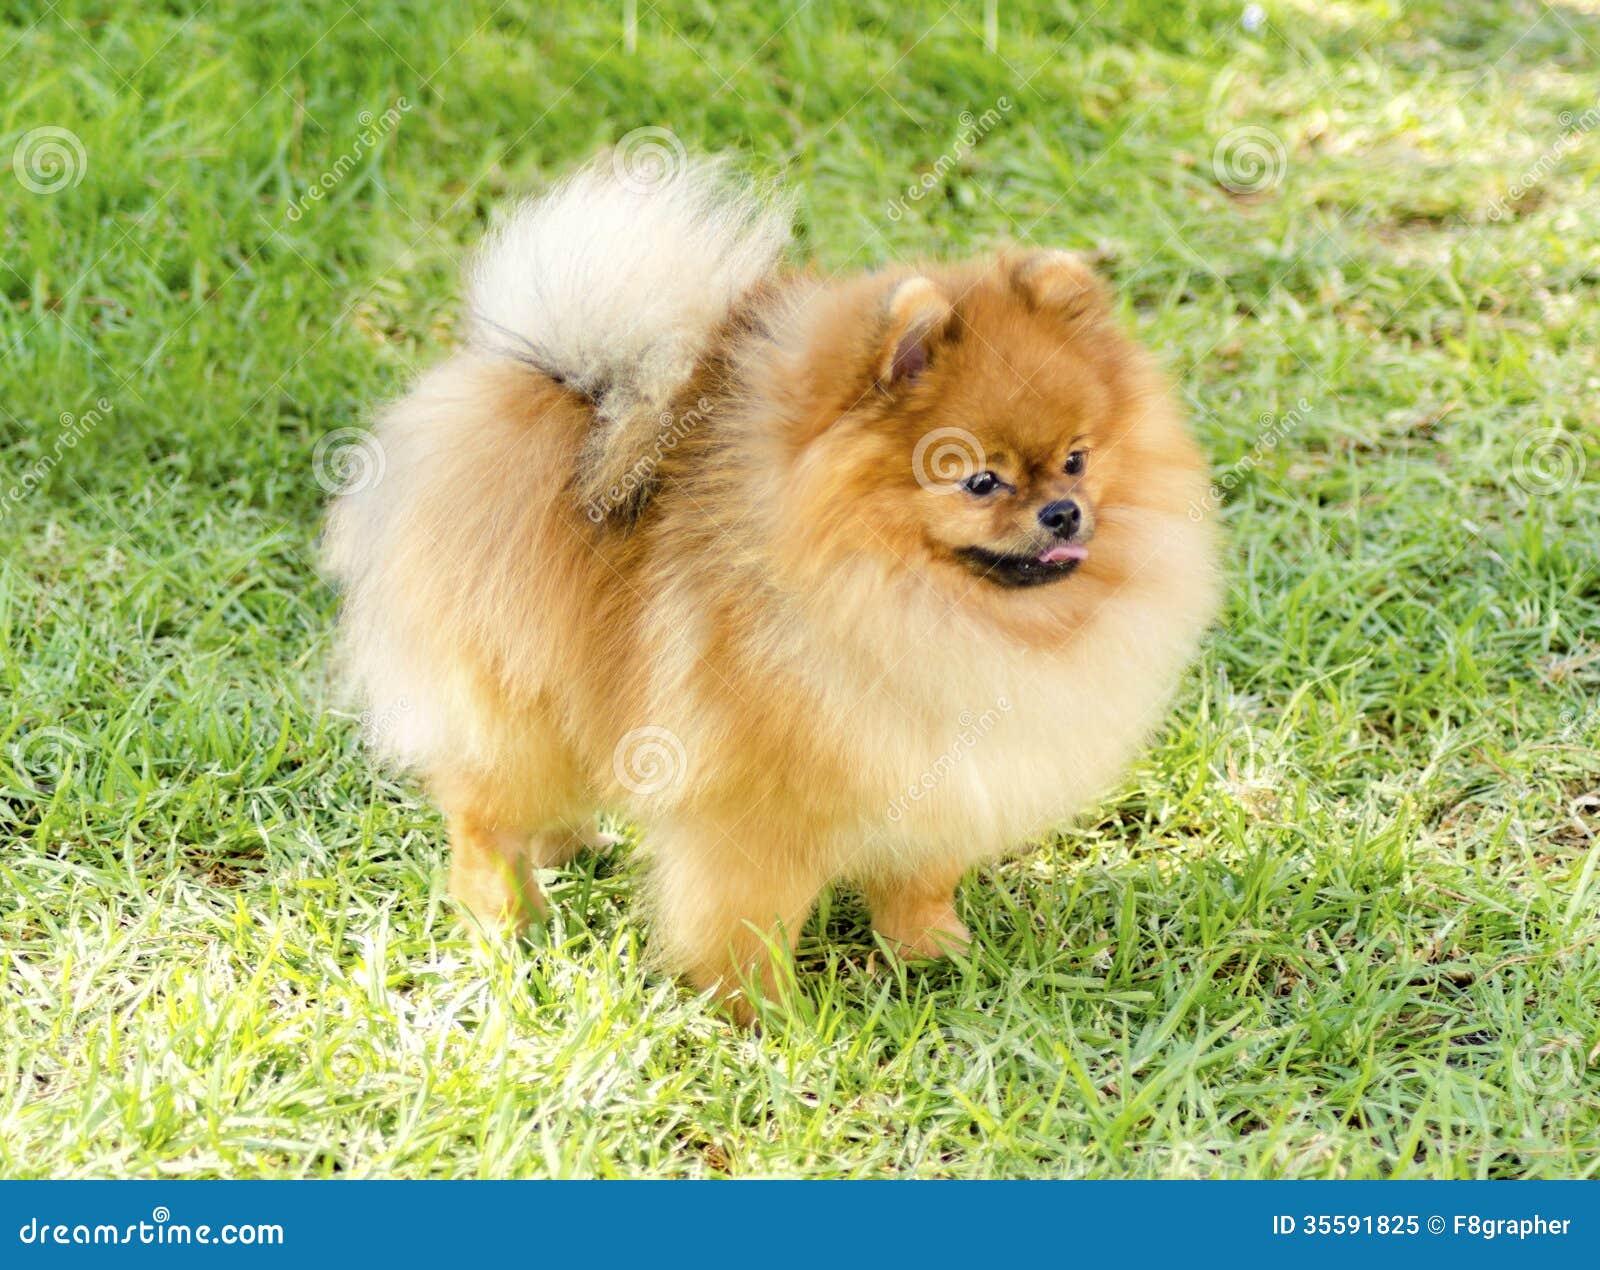 Fat Fluffy Dog Breeds